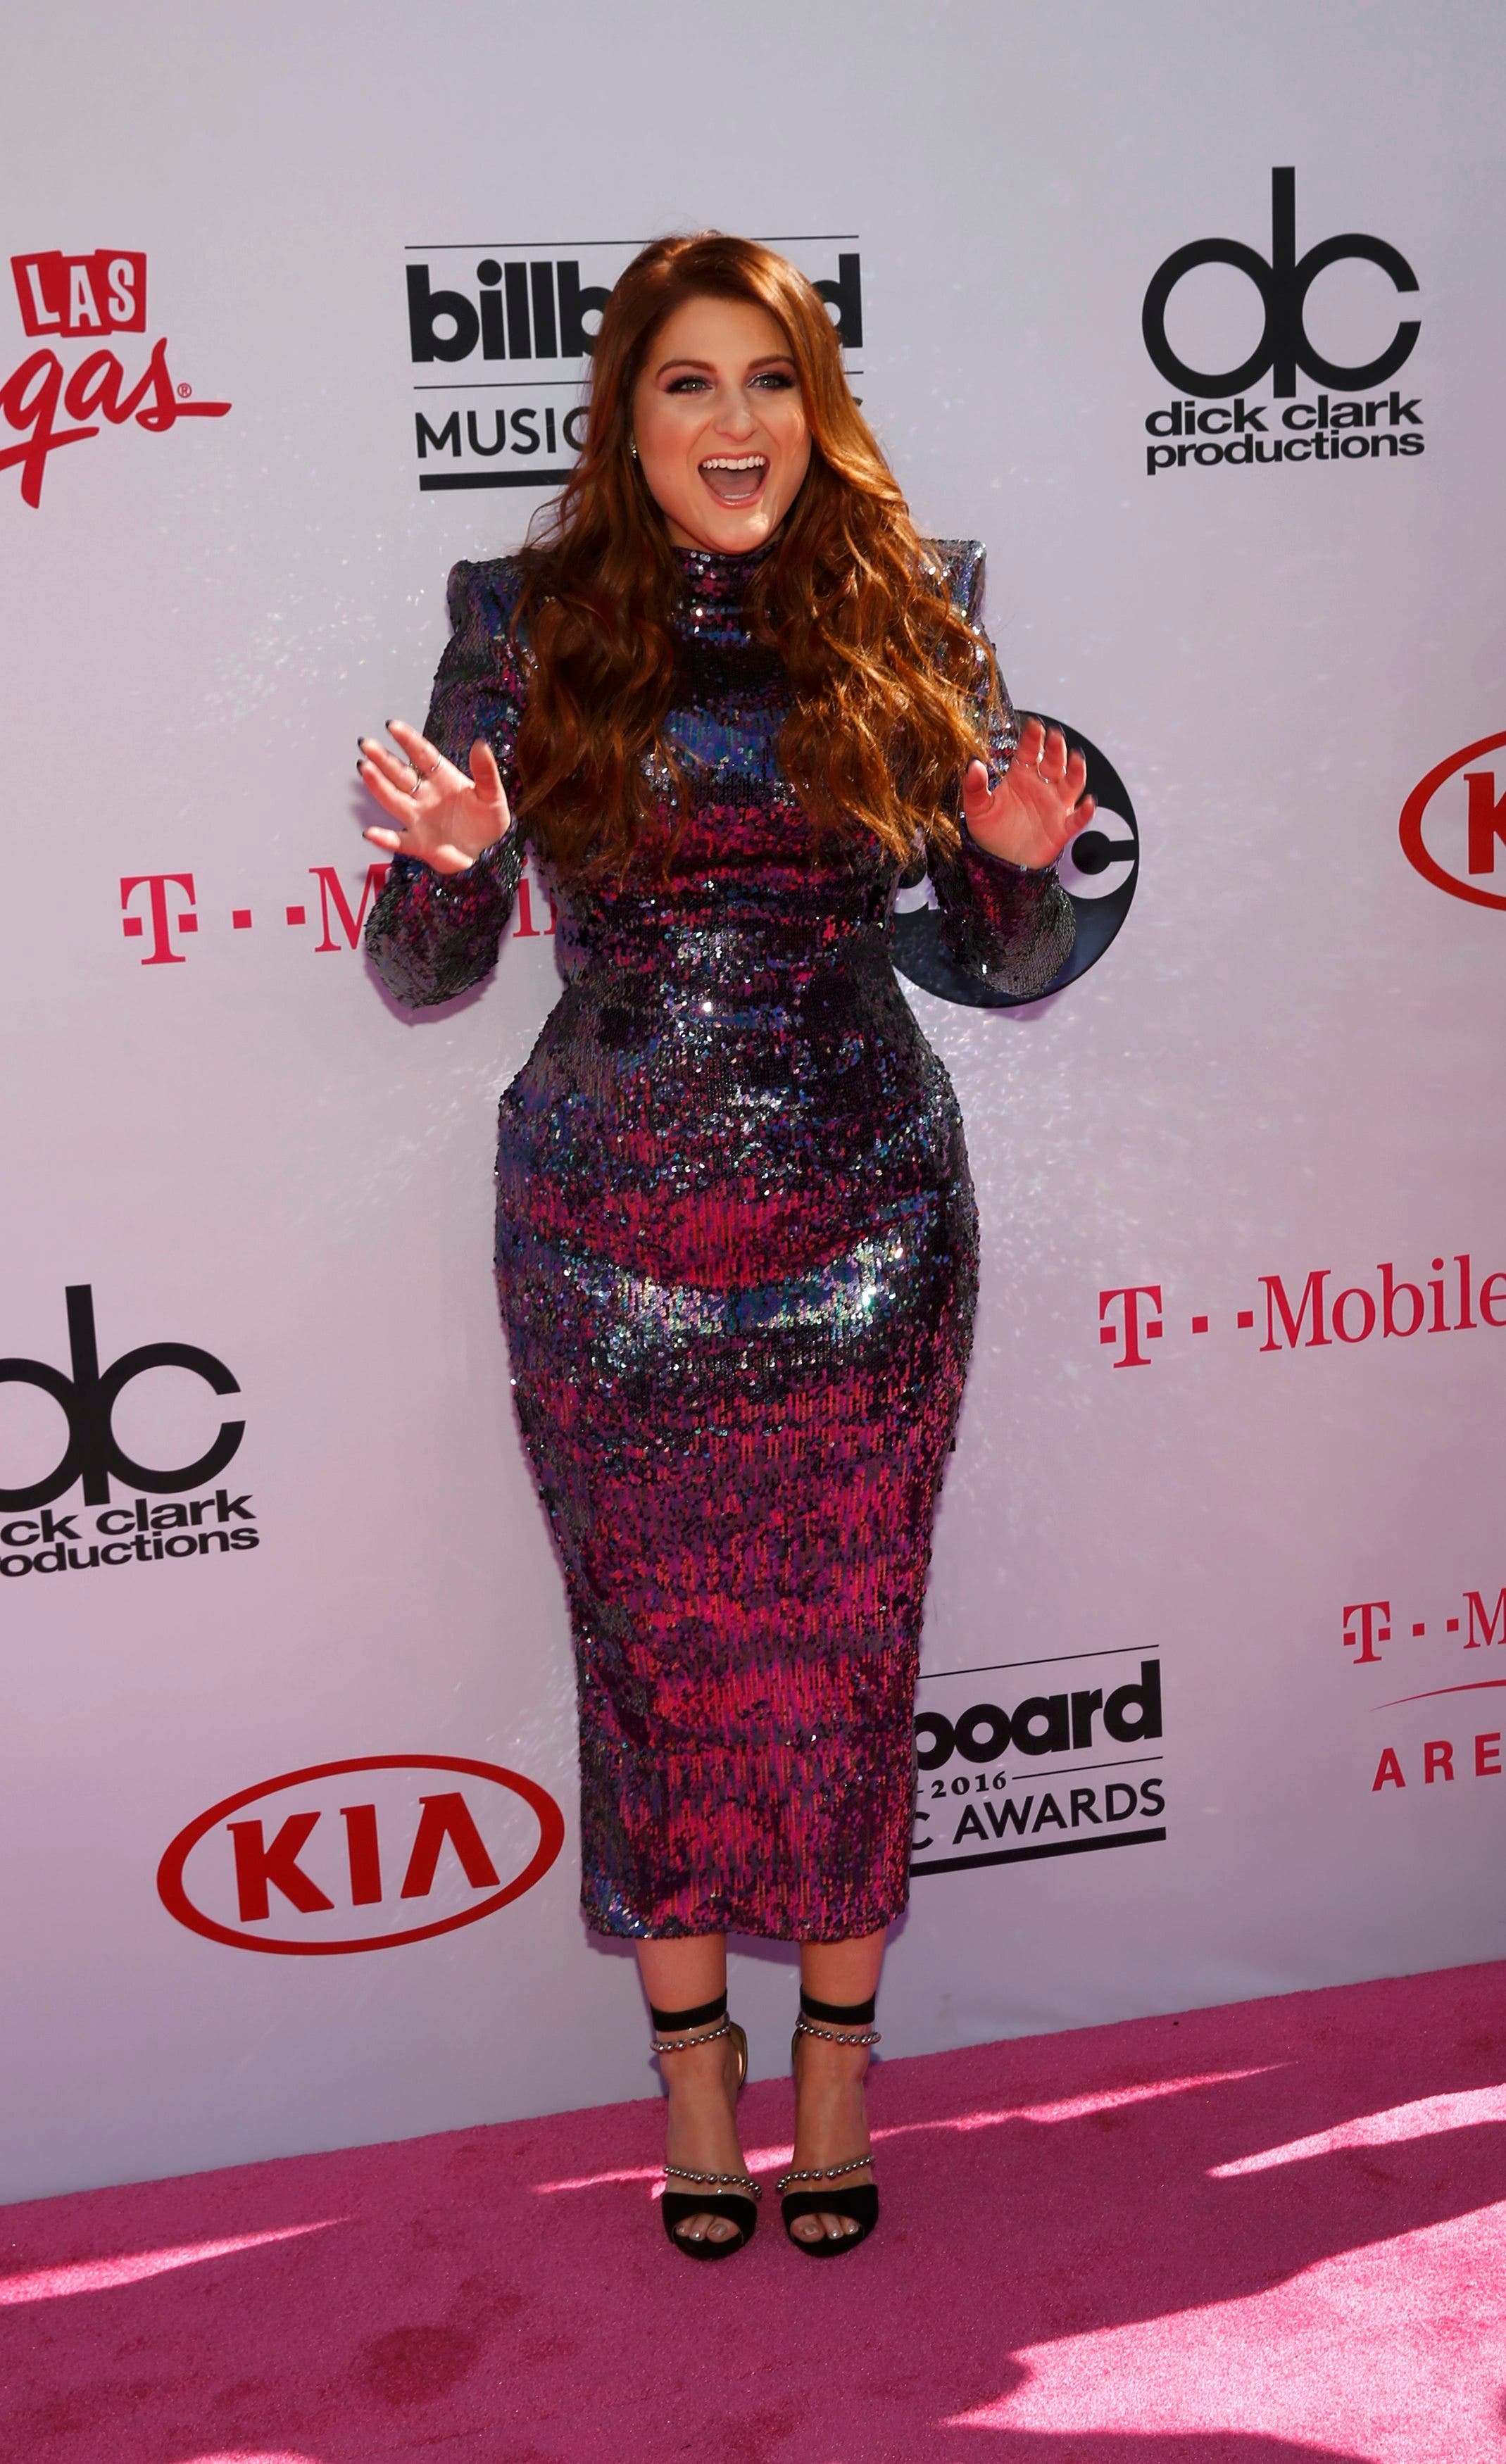 Singer Meghan Trainor arrives at the 2016 Billboard Awards in Las Vegas, Nevada, US, May 22, 2016. (Reuters)